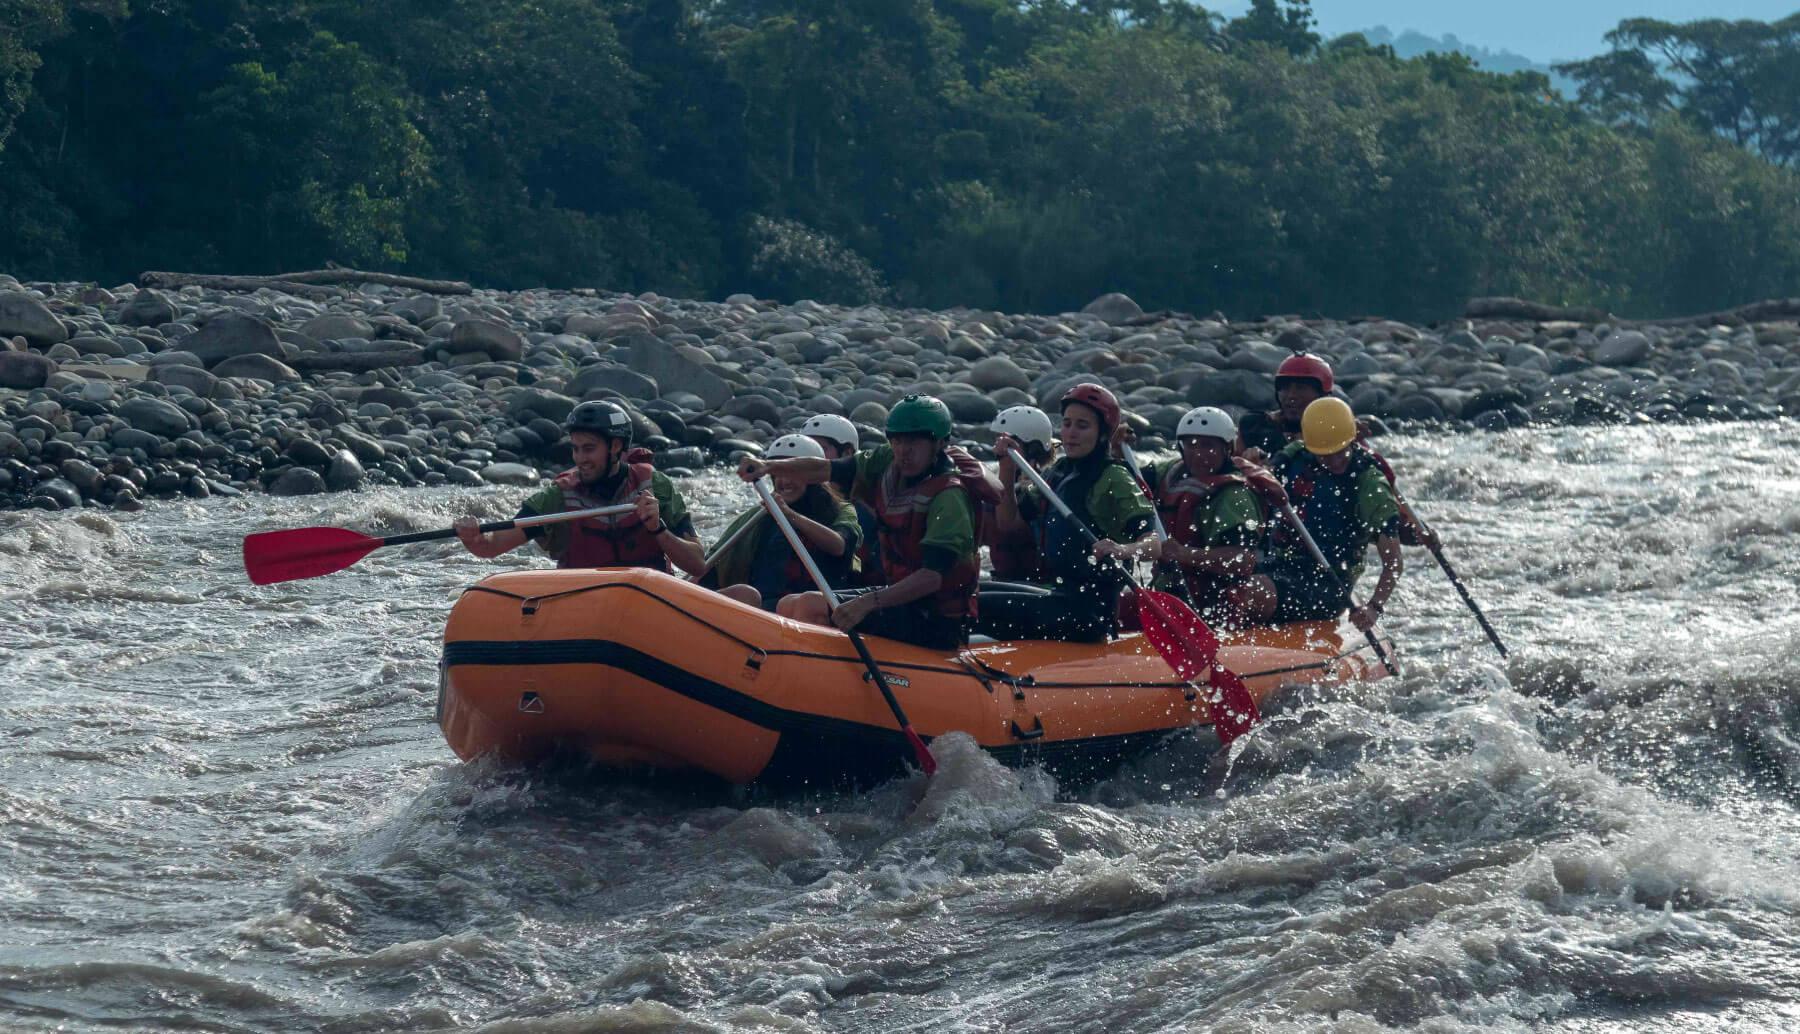 Rafters paddling in Jatunyacu rivers